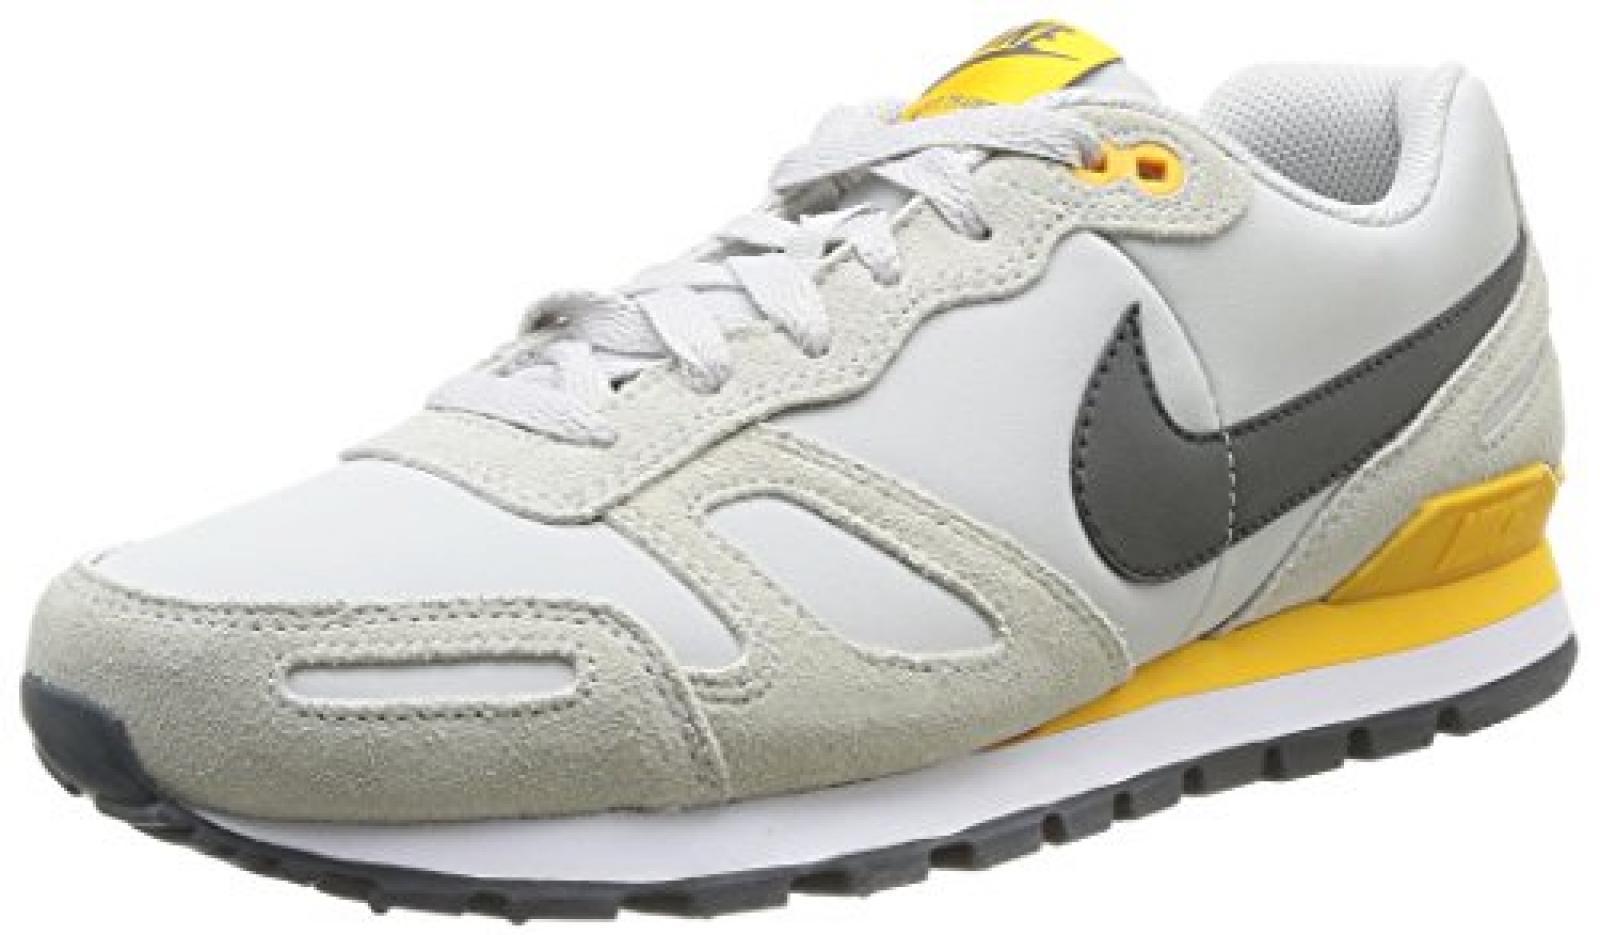 Nike Air Waffle Trainer Leather 454395 Herren Low-Top Sneaker